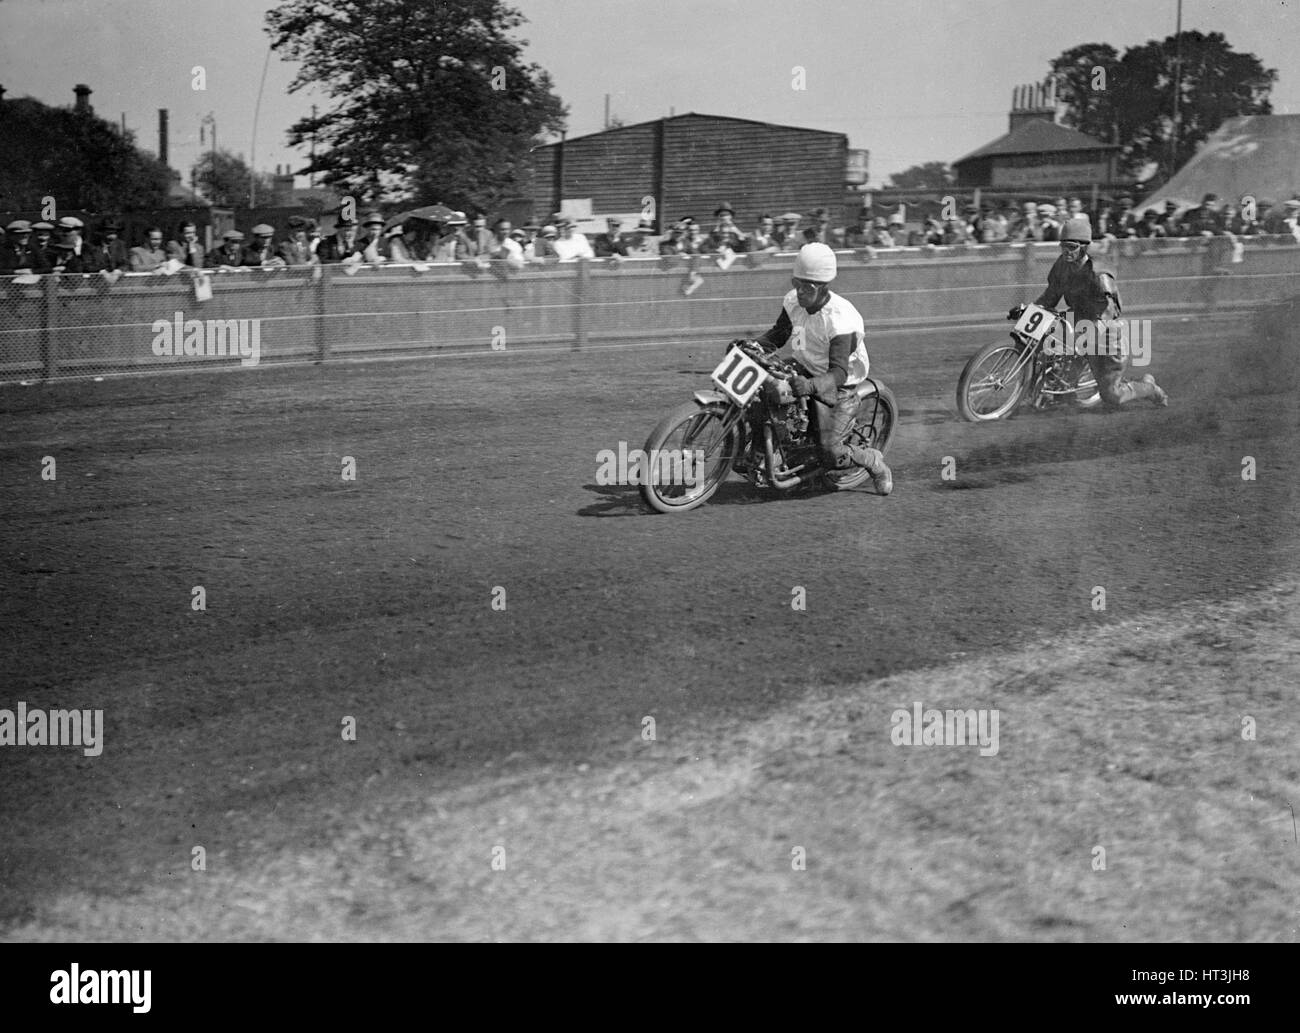 Speedway race at Lea Bridge Stadium, Leyton, London, 1928.   Artist: Bill Brunell. - Stock Image